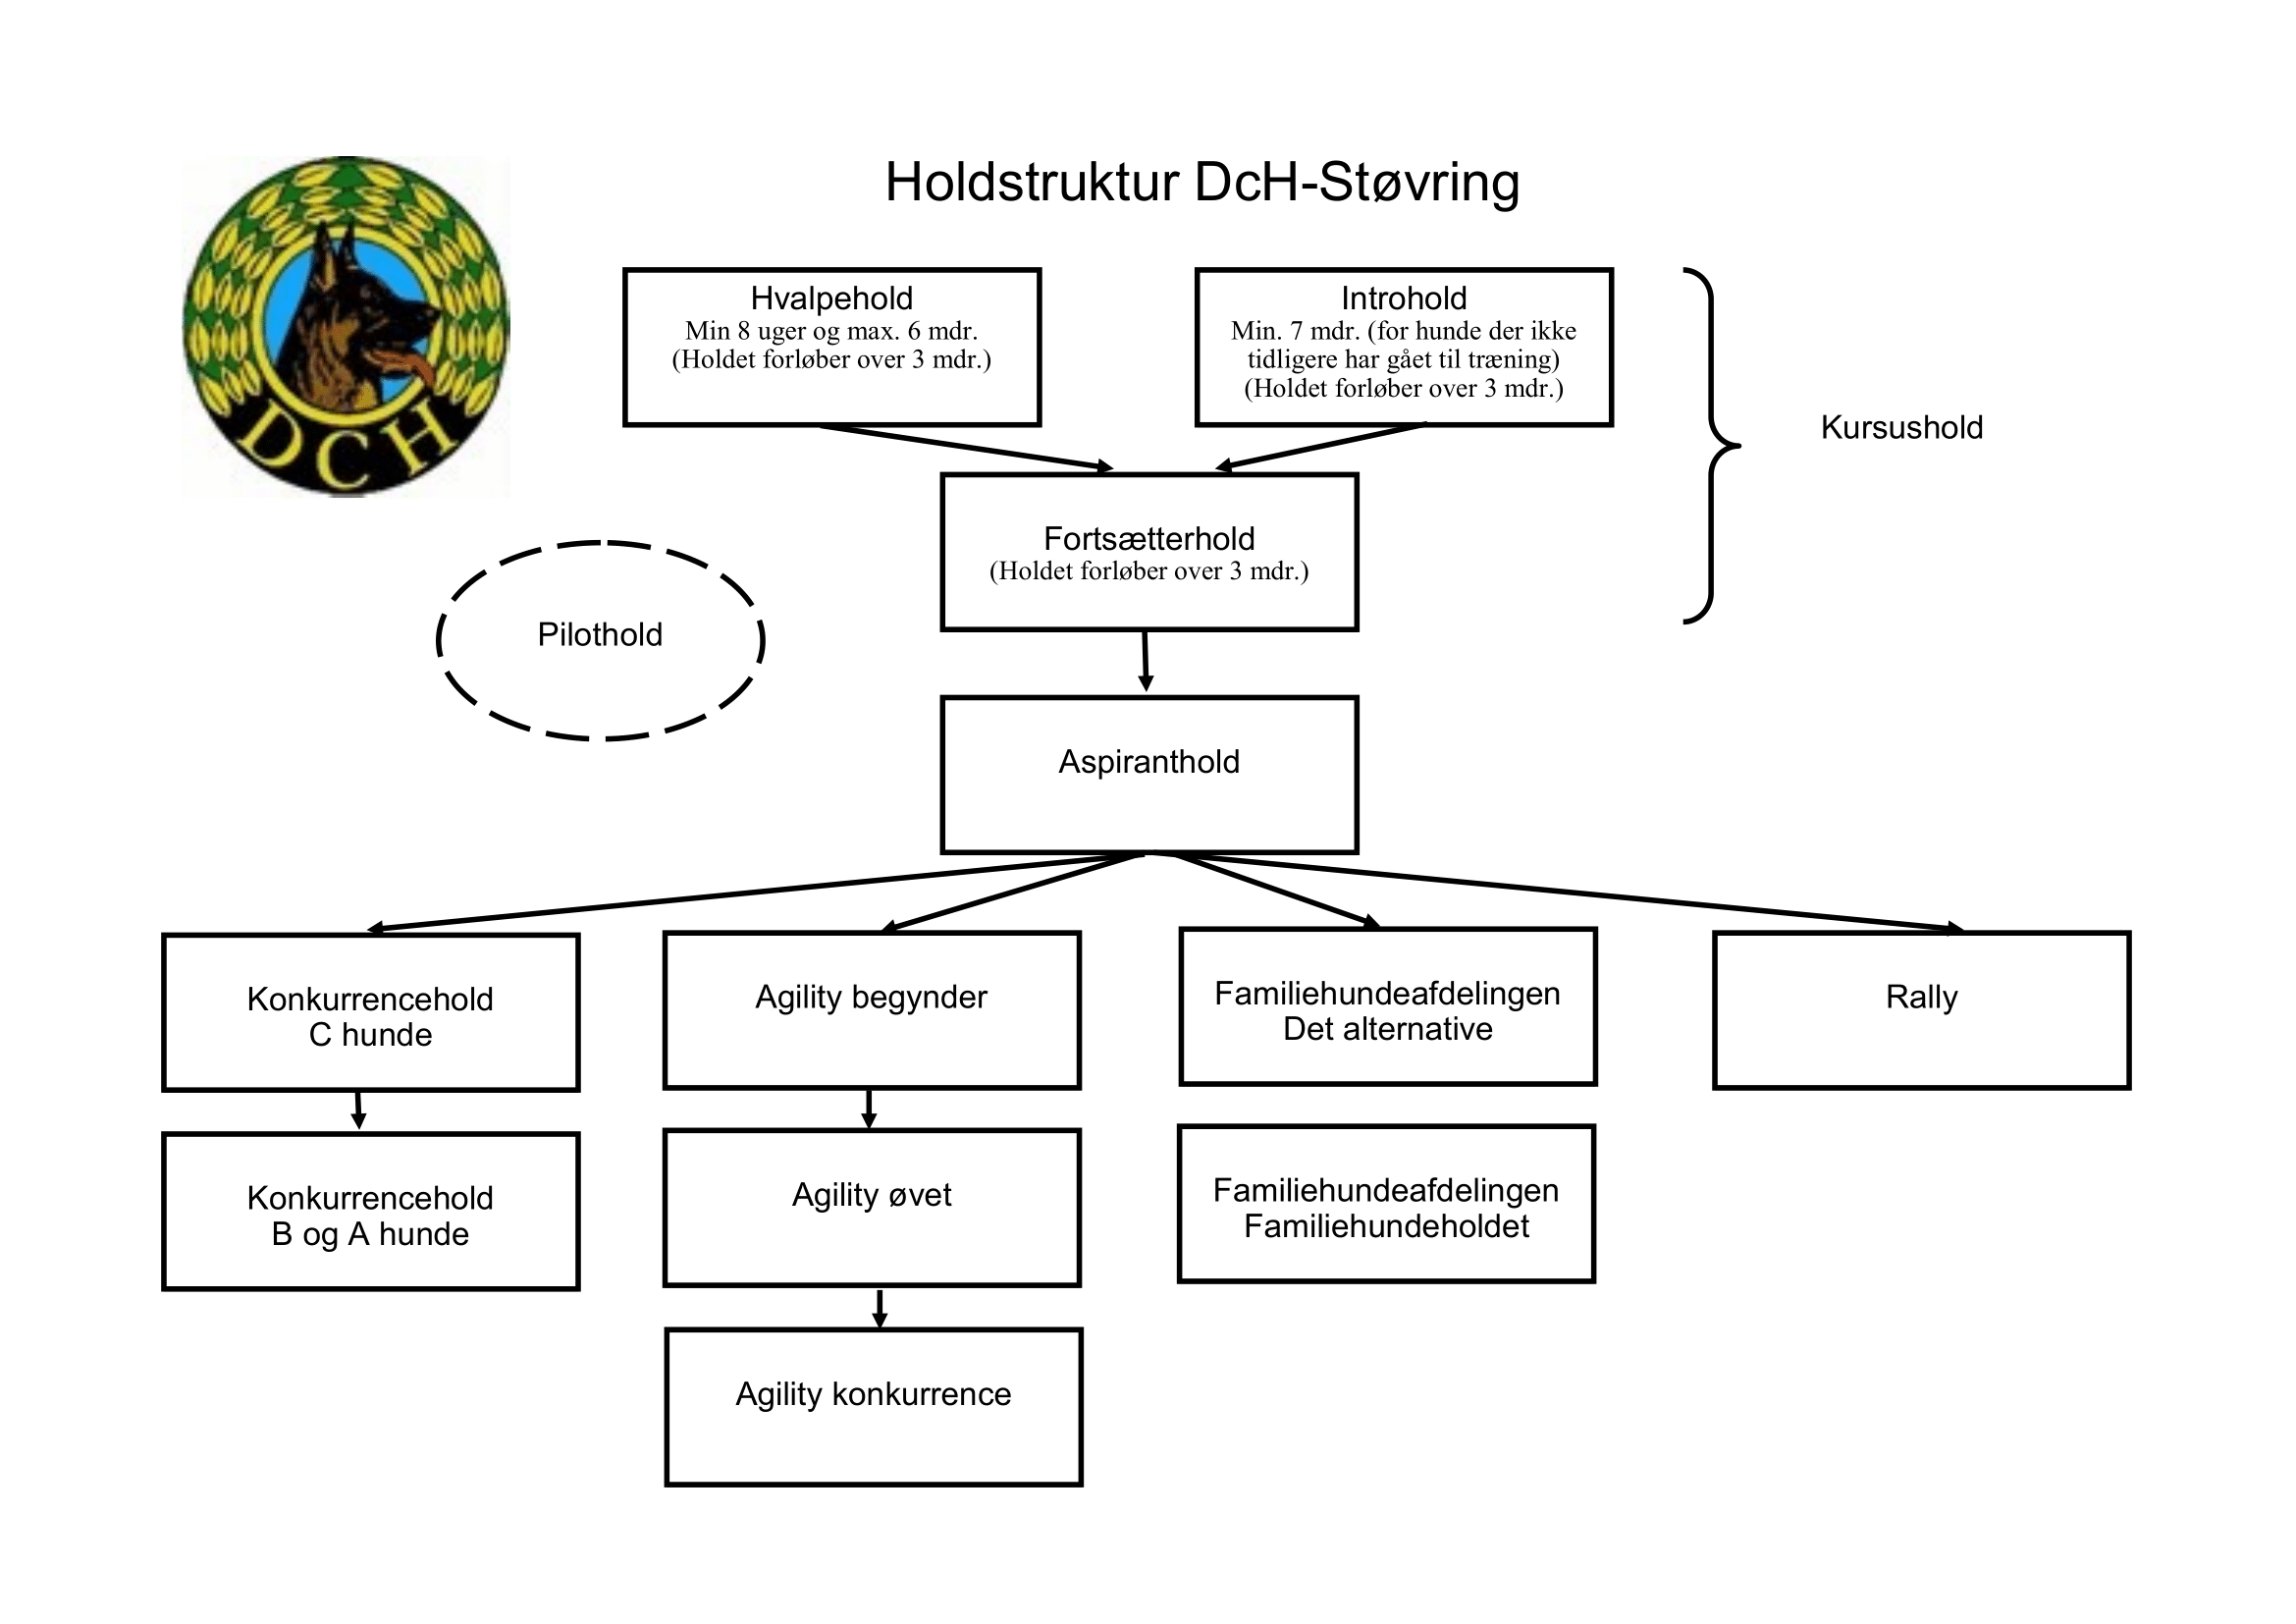 Holdstruktur DCH